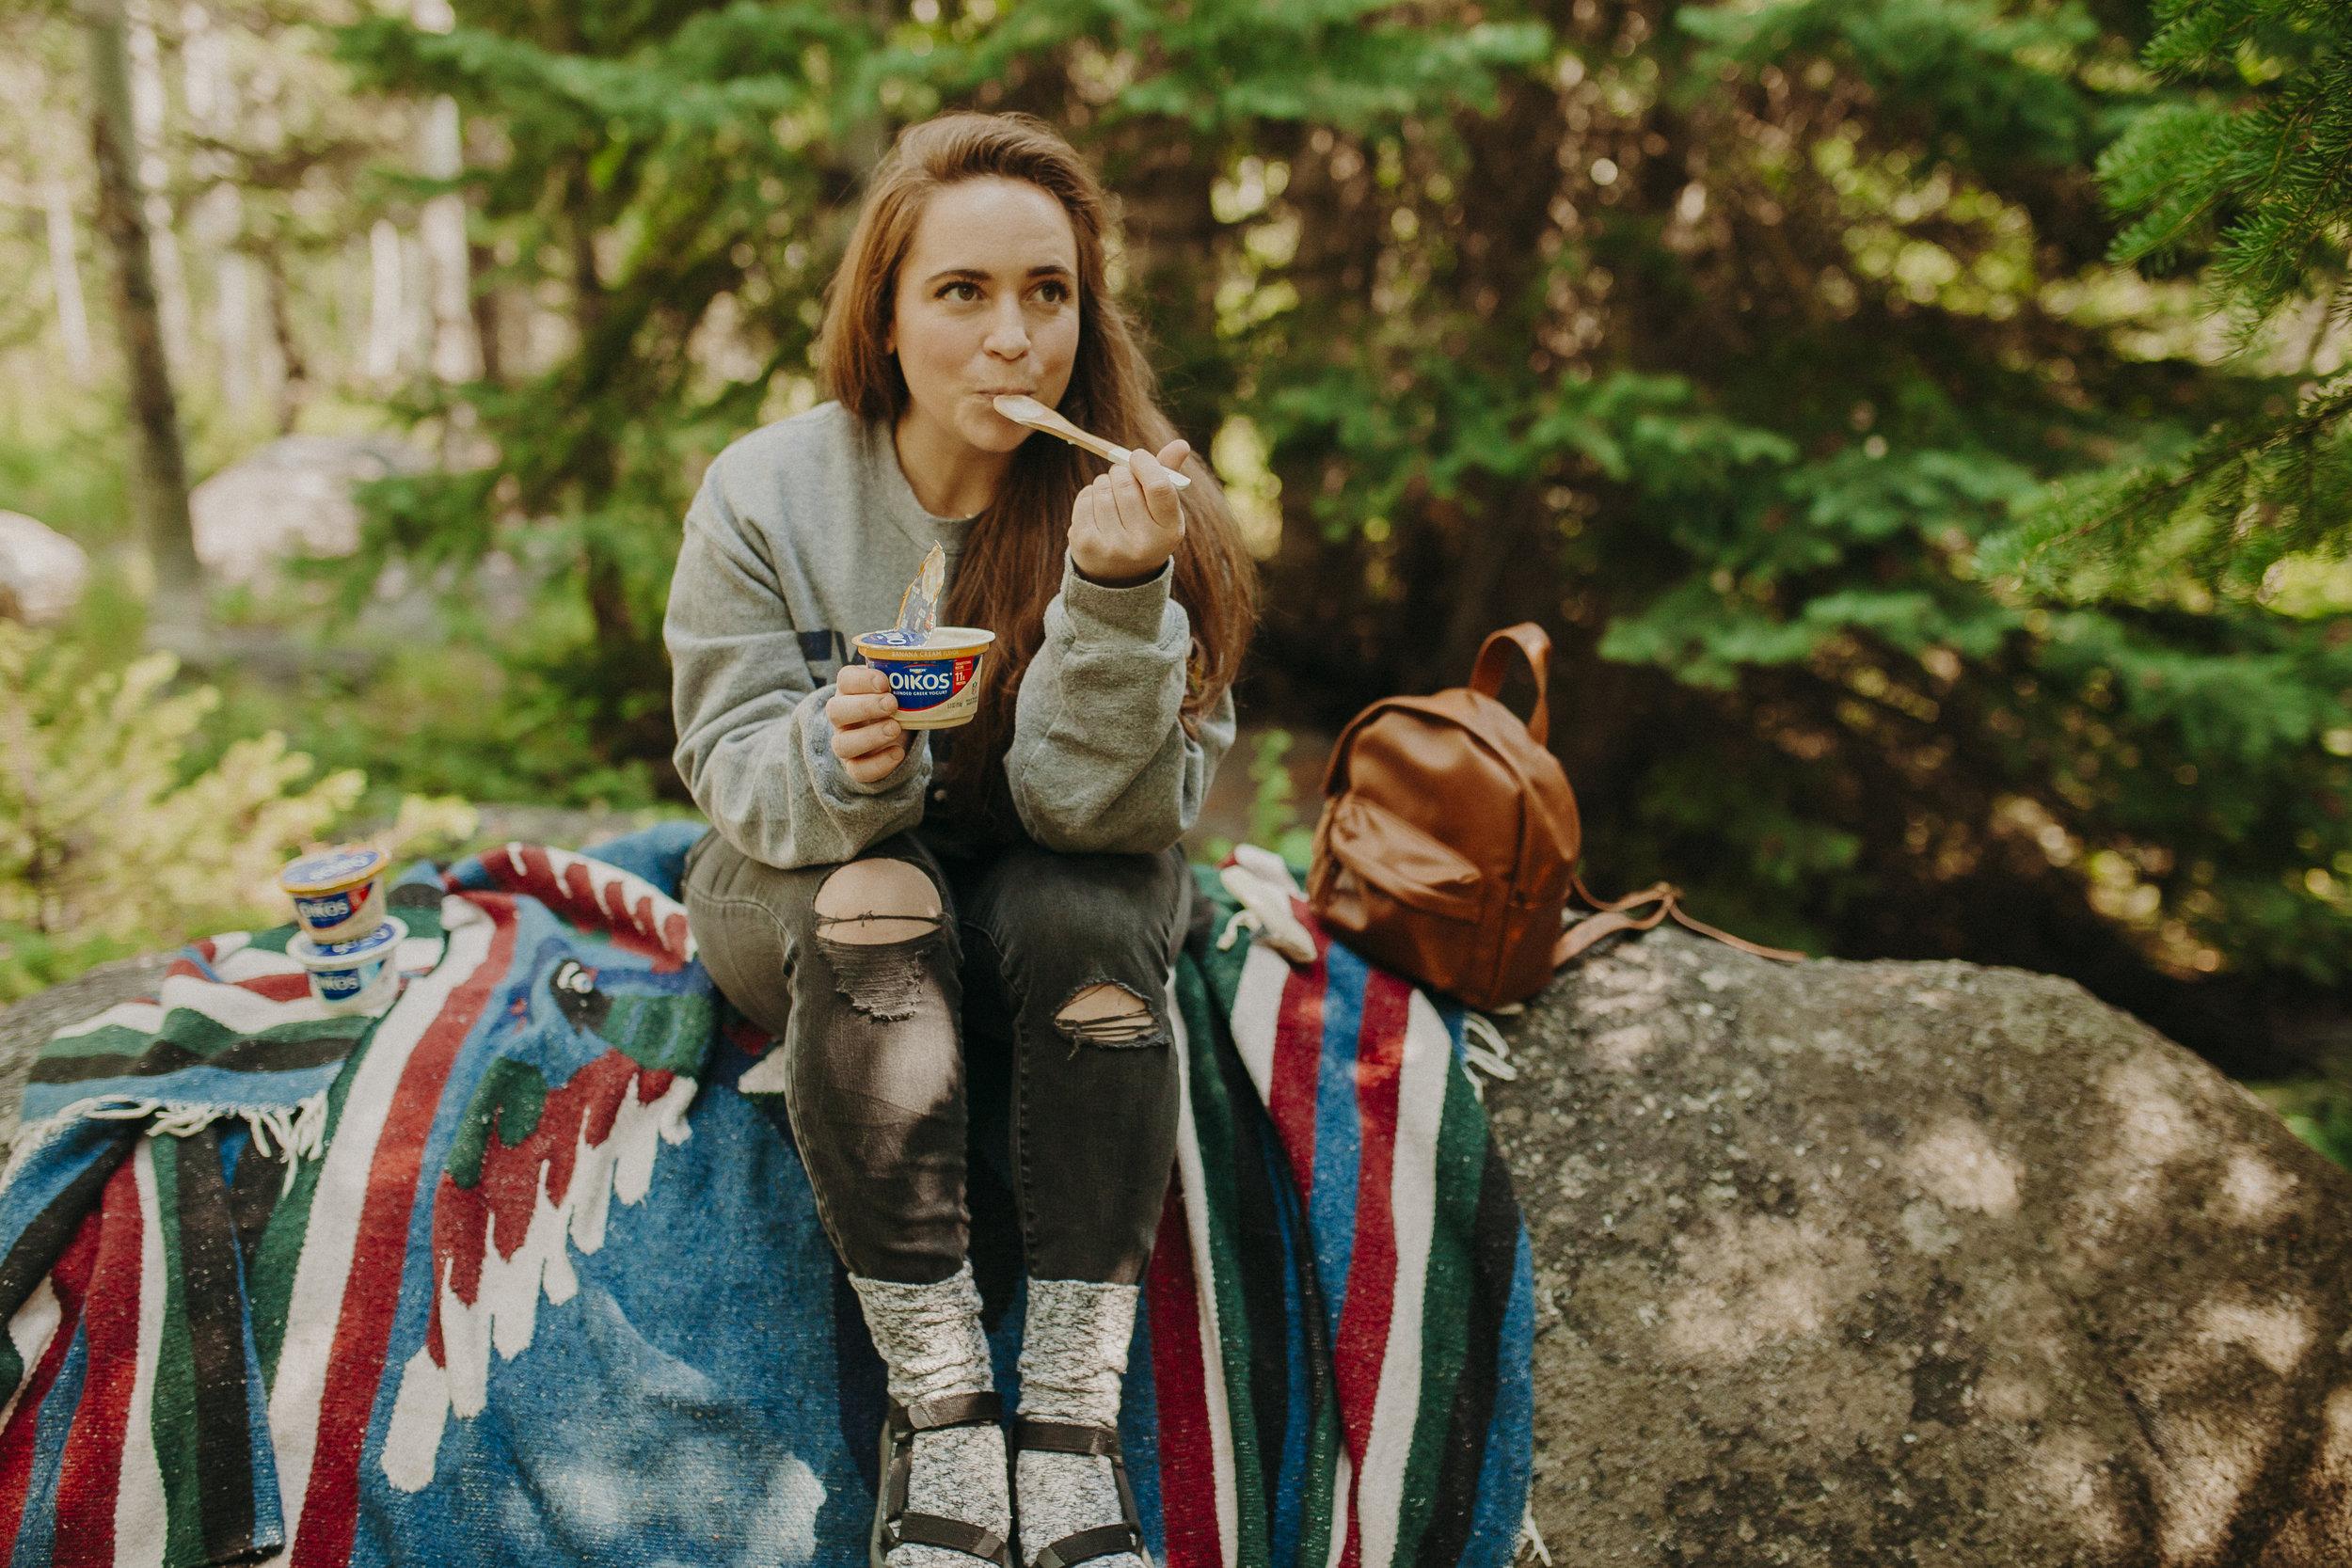 oikos-greek-yogurt-camping-breakfast-ideas-12.jpg